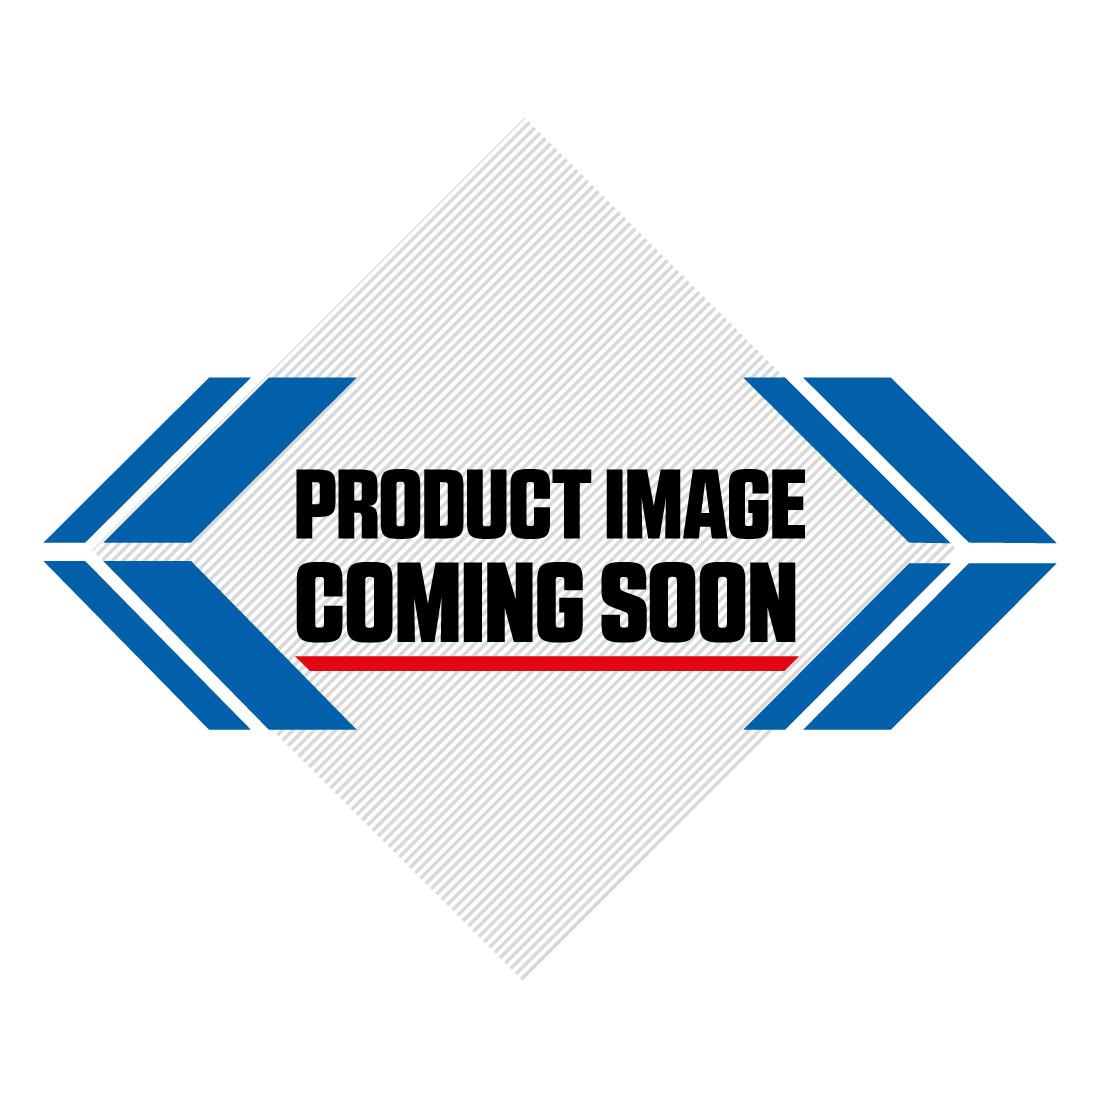 Honda Plastic Kit CR 125 (87-88) OEM Factory (1988) Image-2>